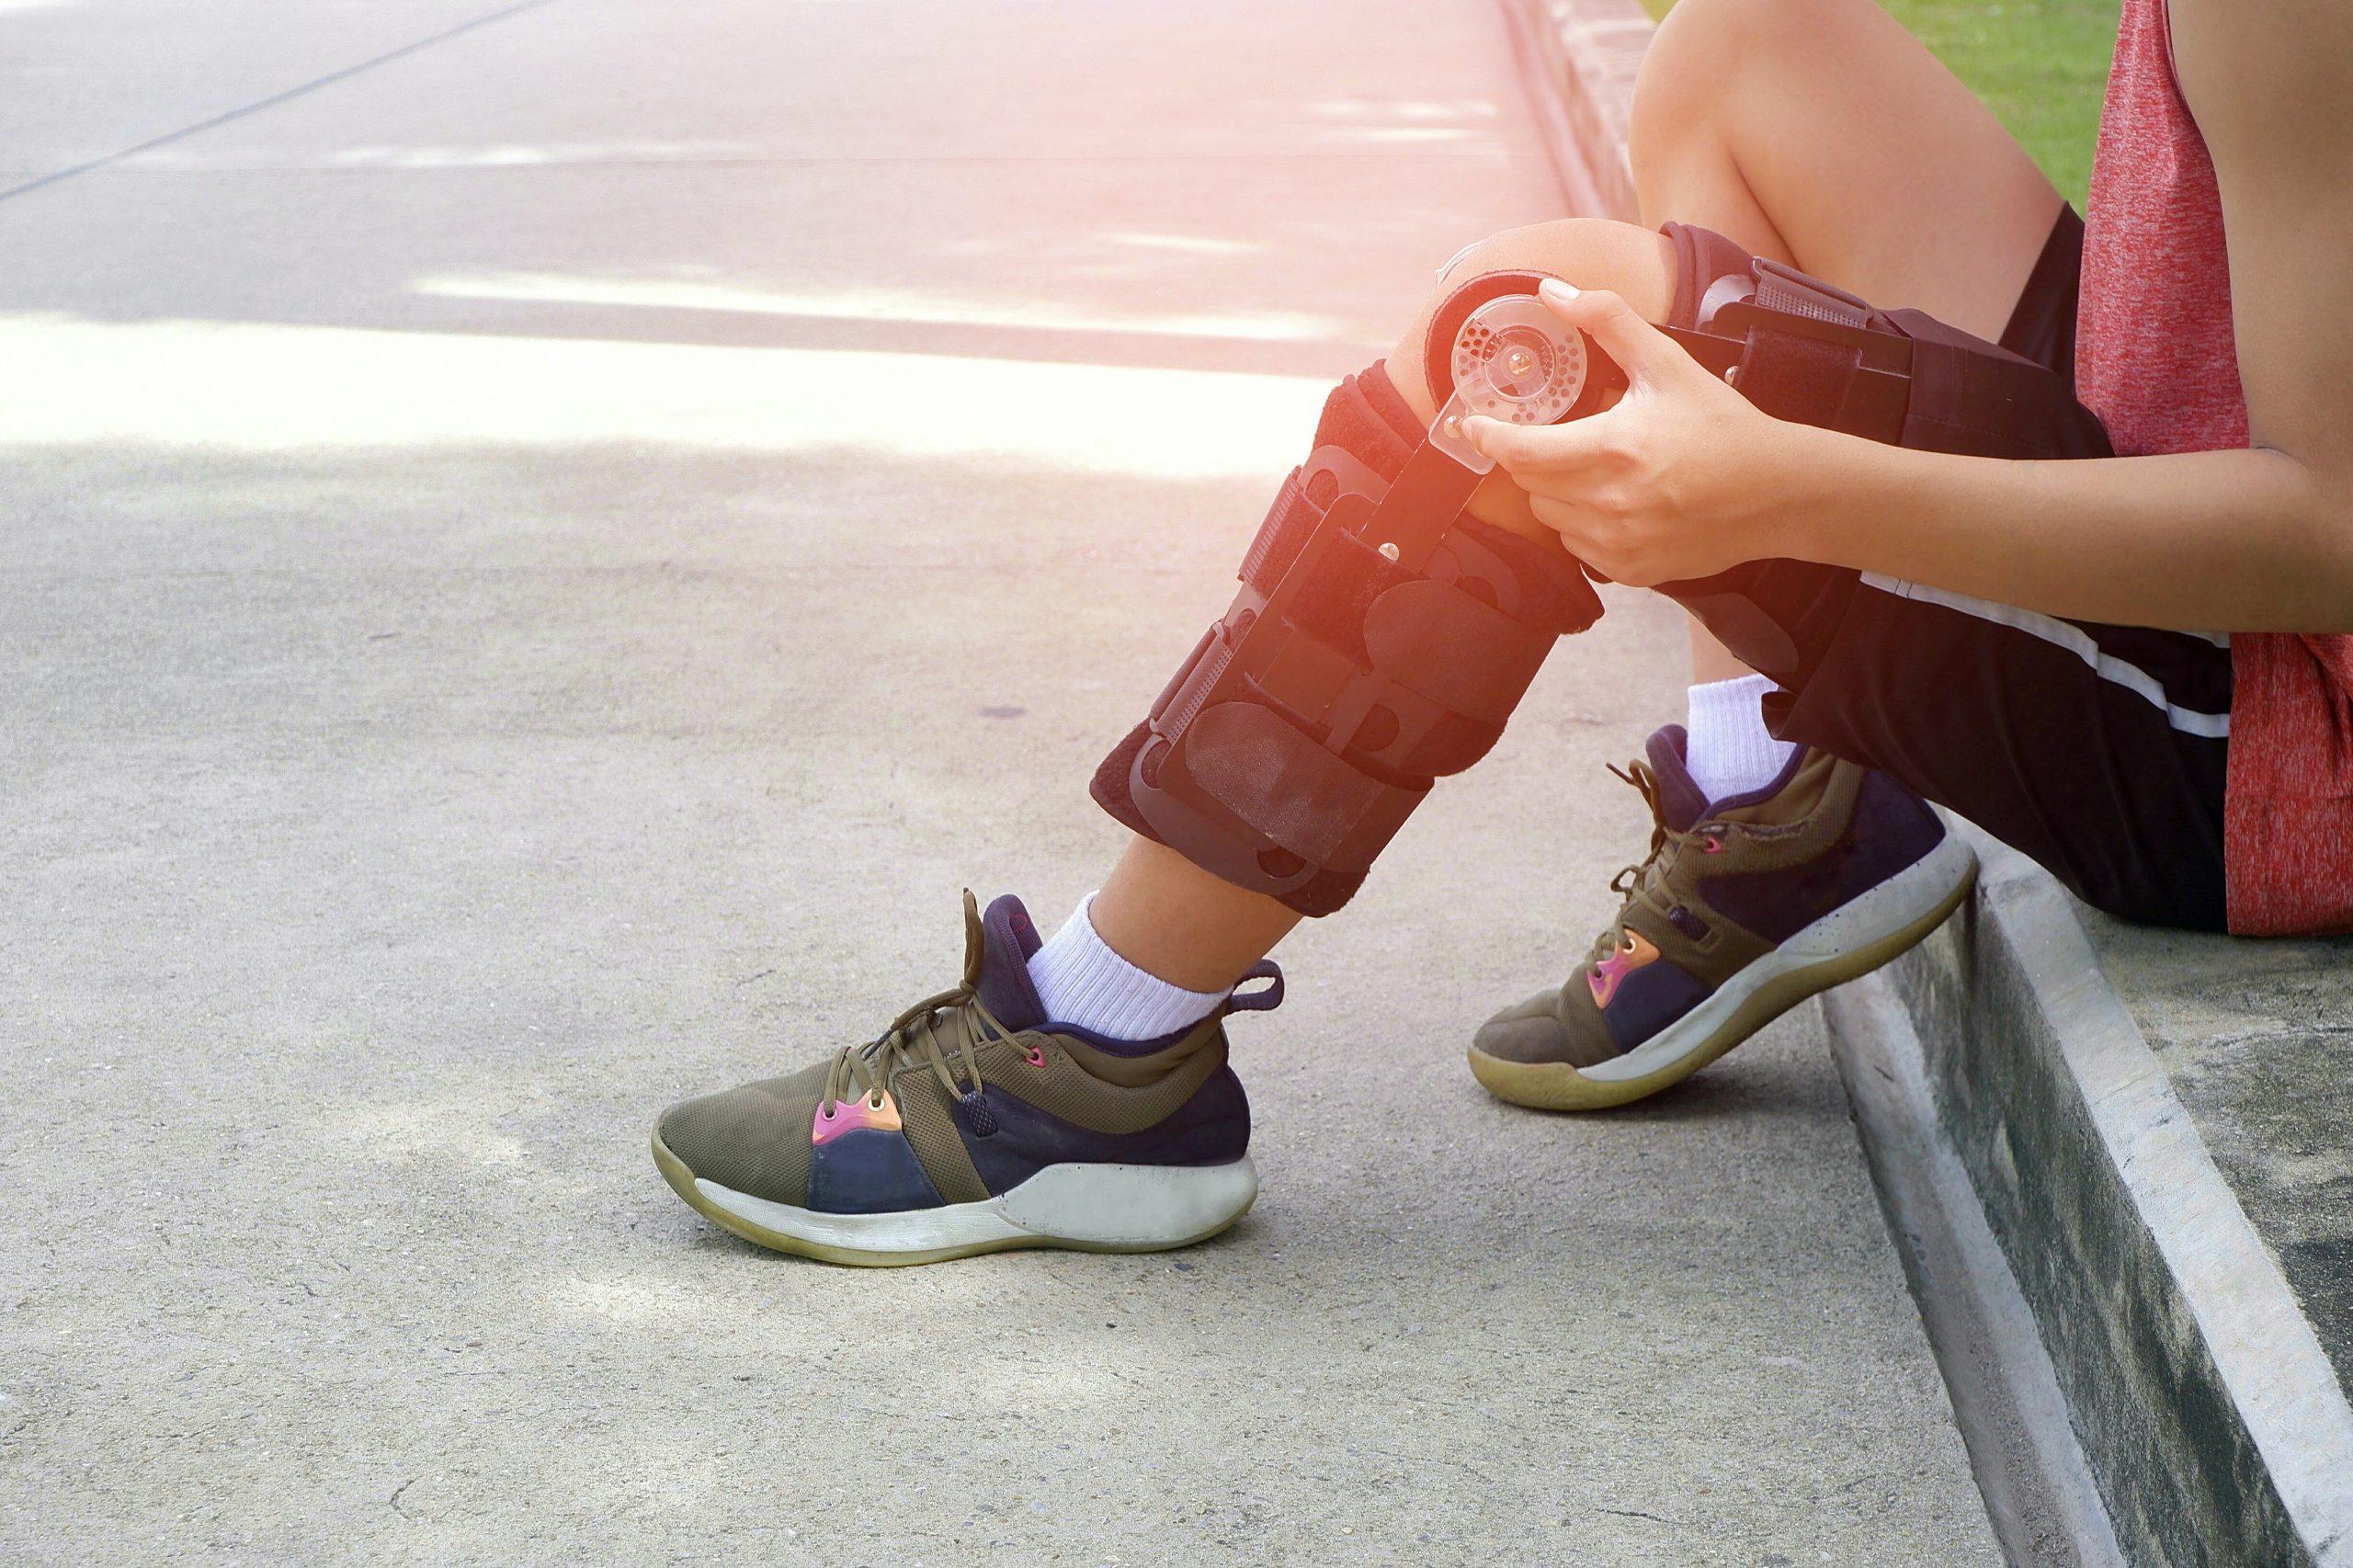 Teenage boy sitting on sidewalk with knee brace